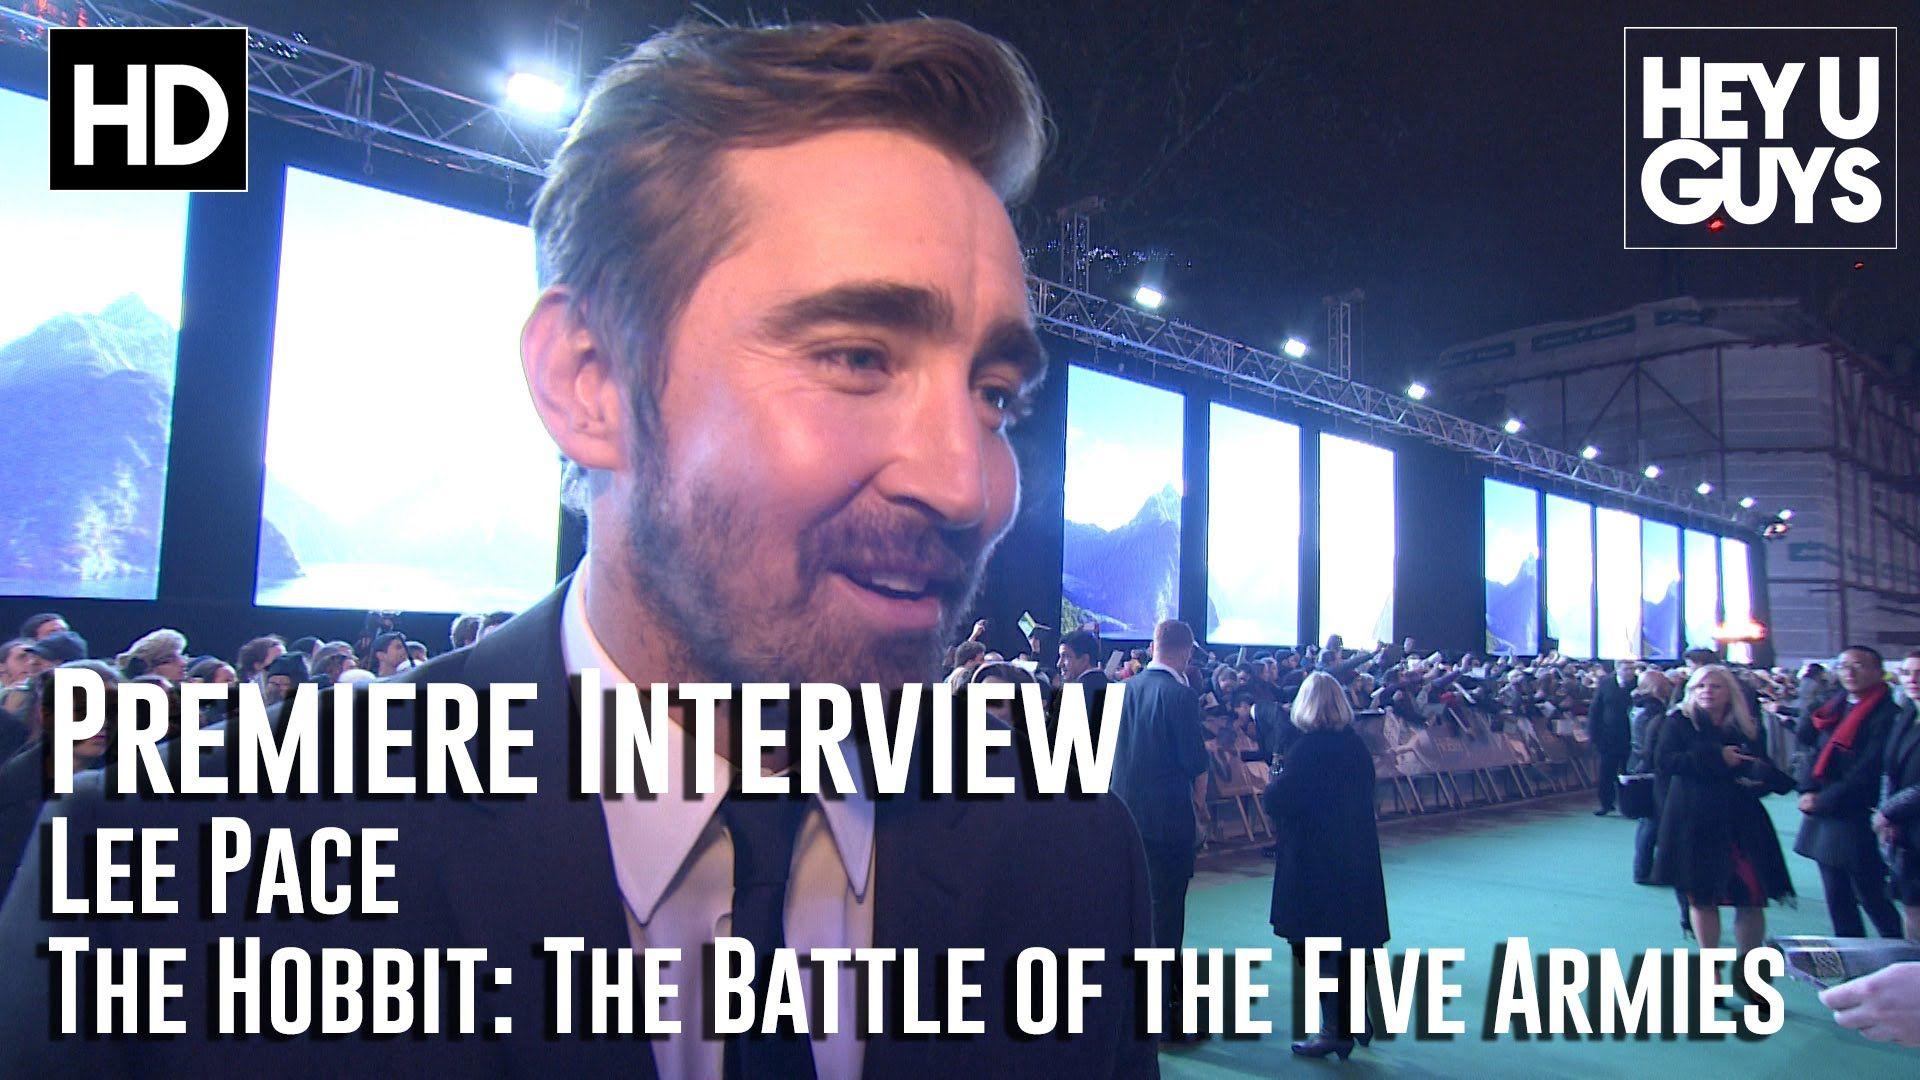 Lee Pace Interview - The Hobbit: The Battle of the Five Armies Premiere